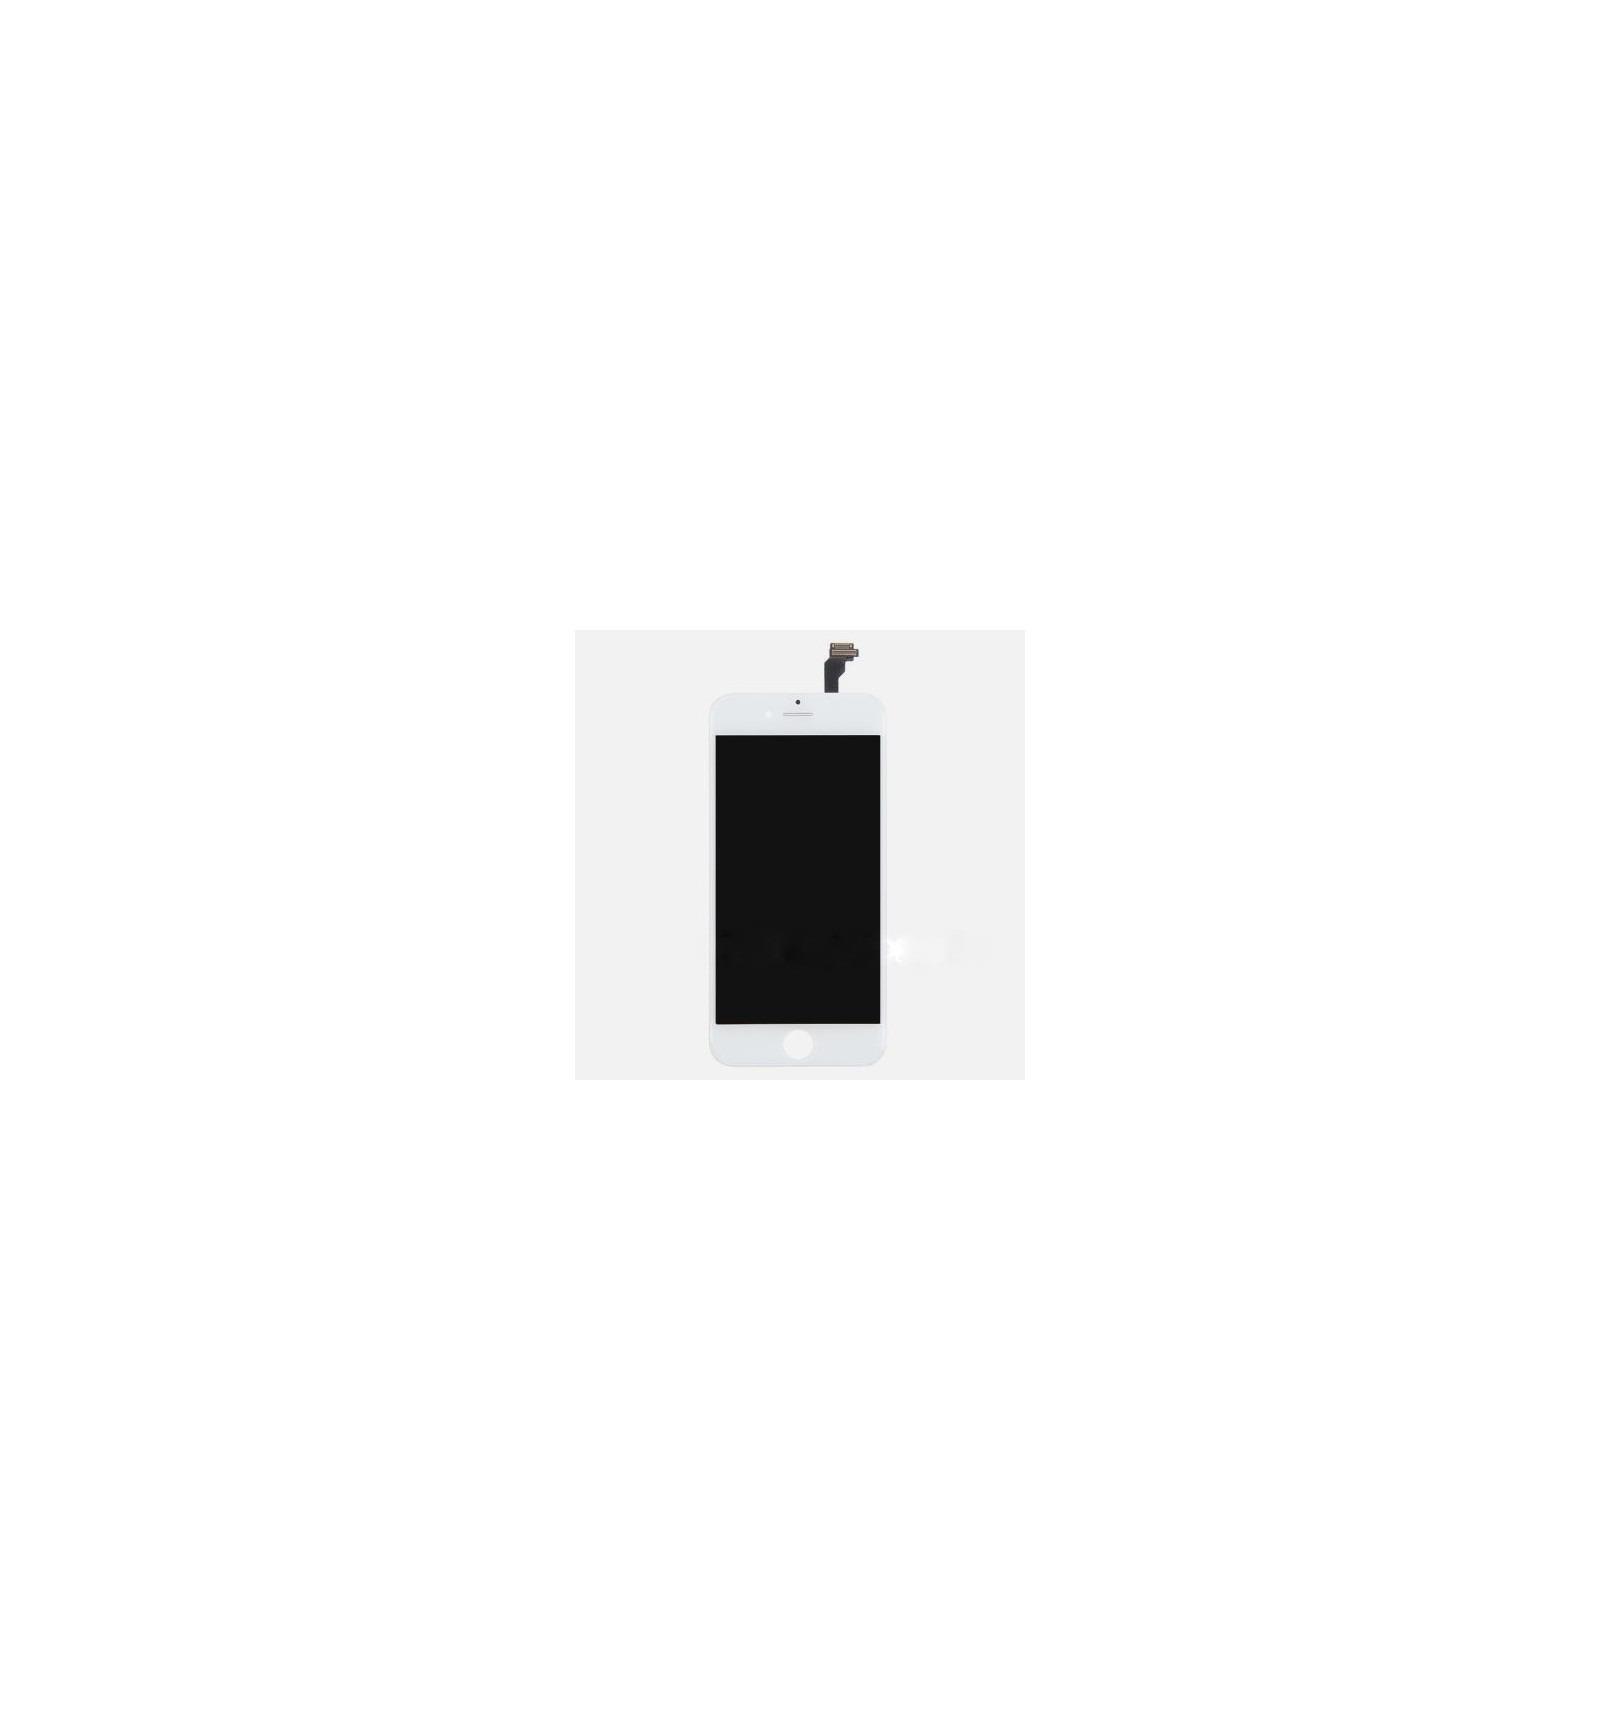 Iphone 6 Pantalla Lcd Cristal Blanco 100 Original